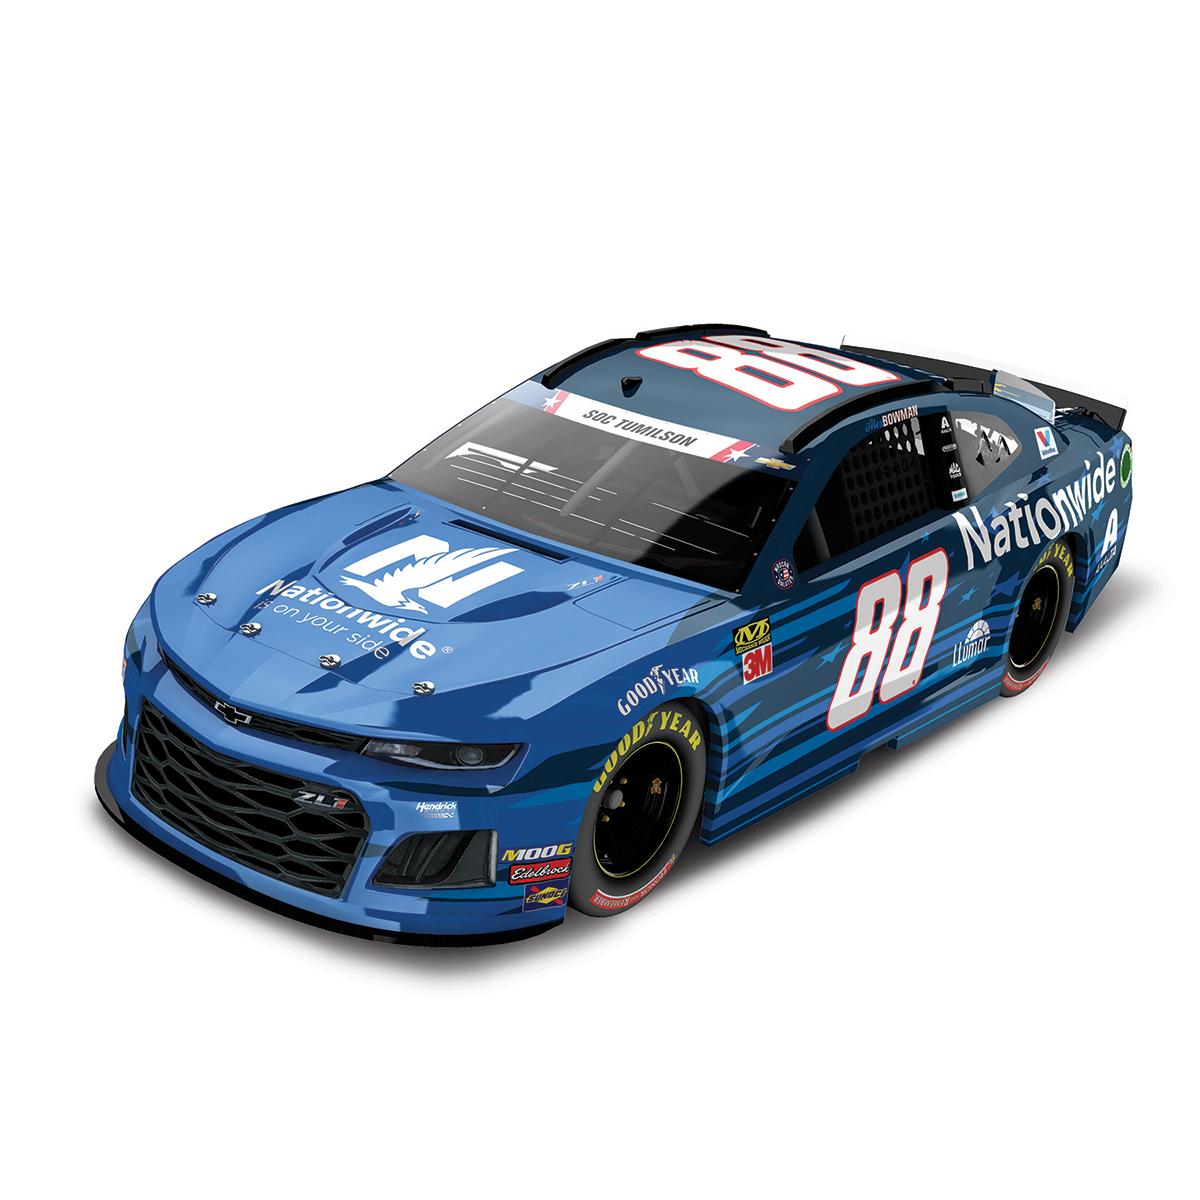 Alex Bowman 2019 #88 NASCAR Nationwide Patriotic Elite 1:24 - Die Cast